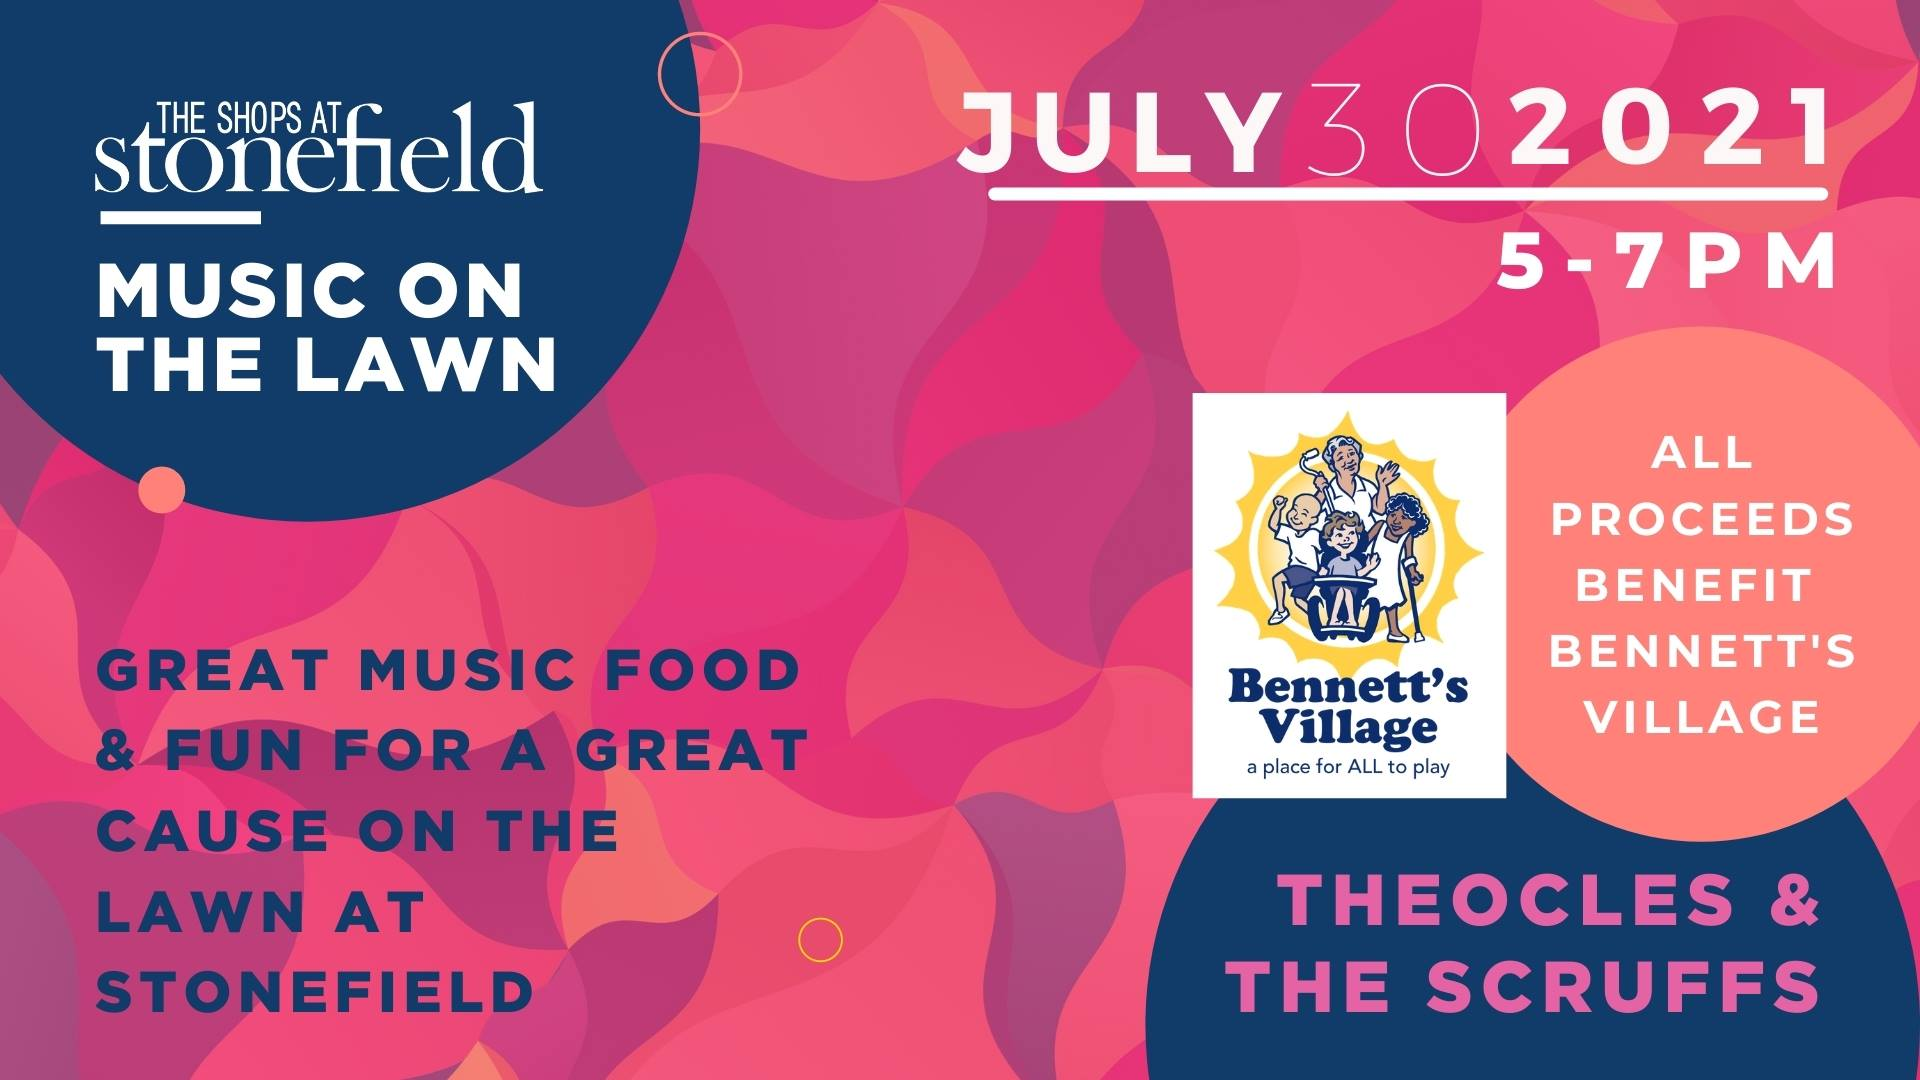 Advertisement for Bennett's Village event on July, 30, 2021